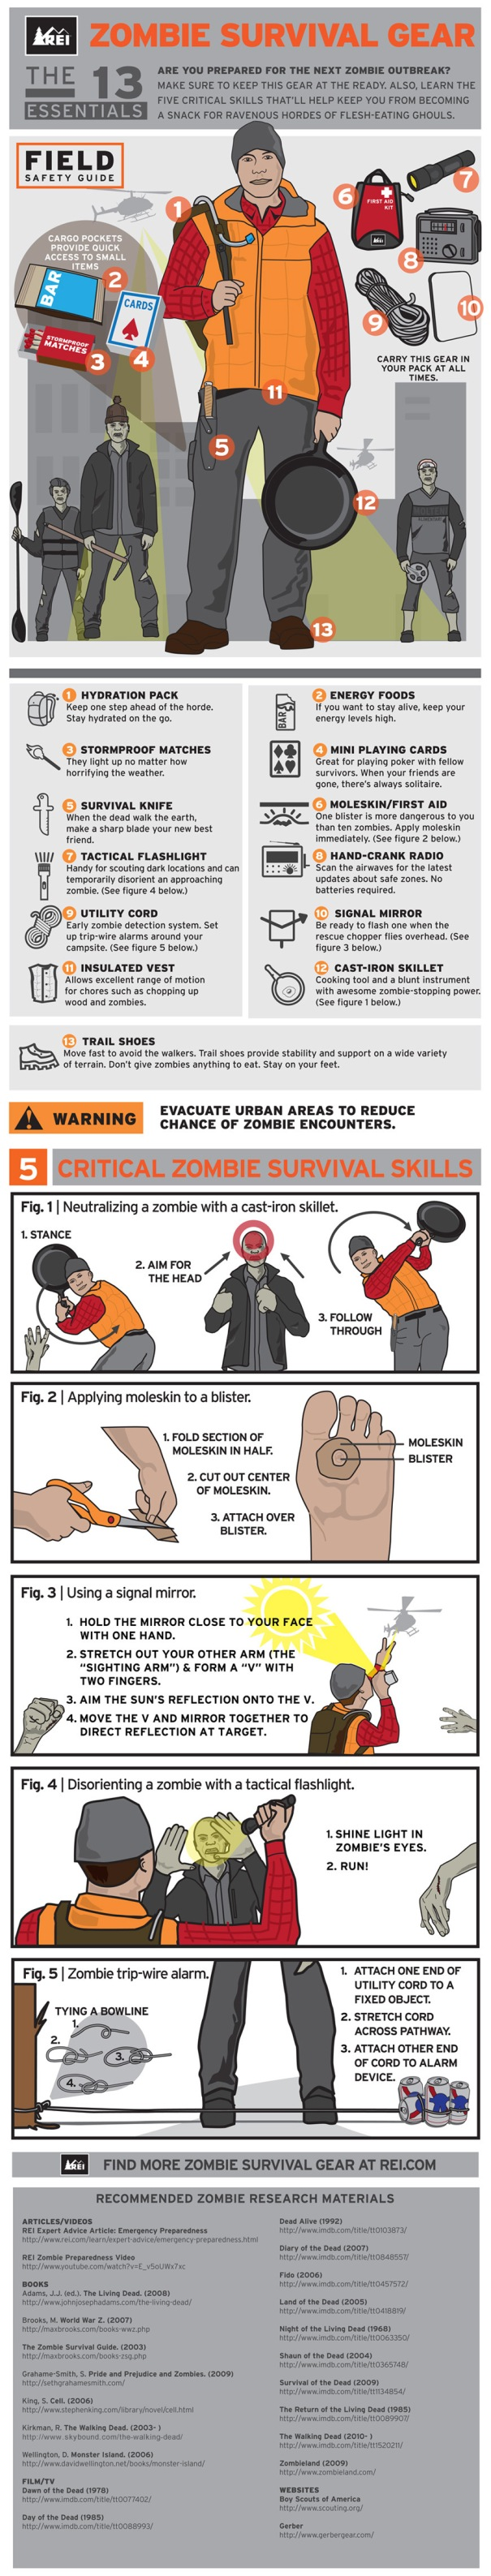 REI Zombie Guide